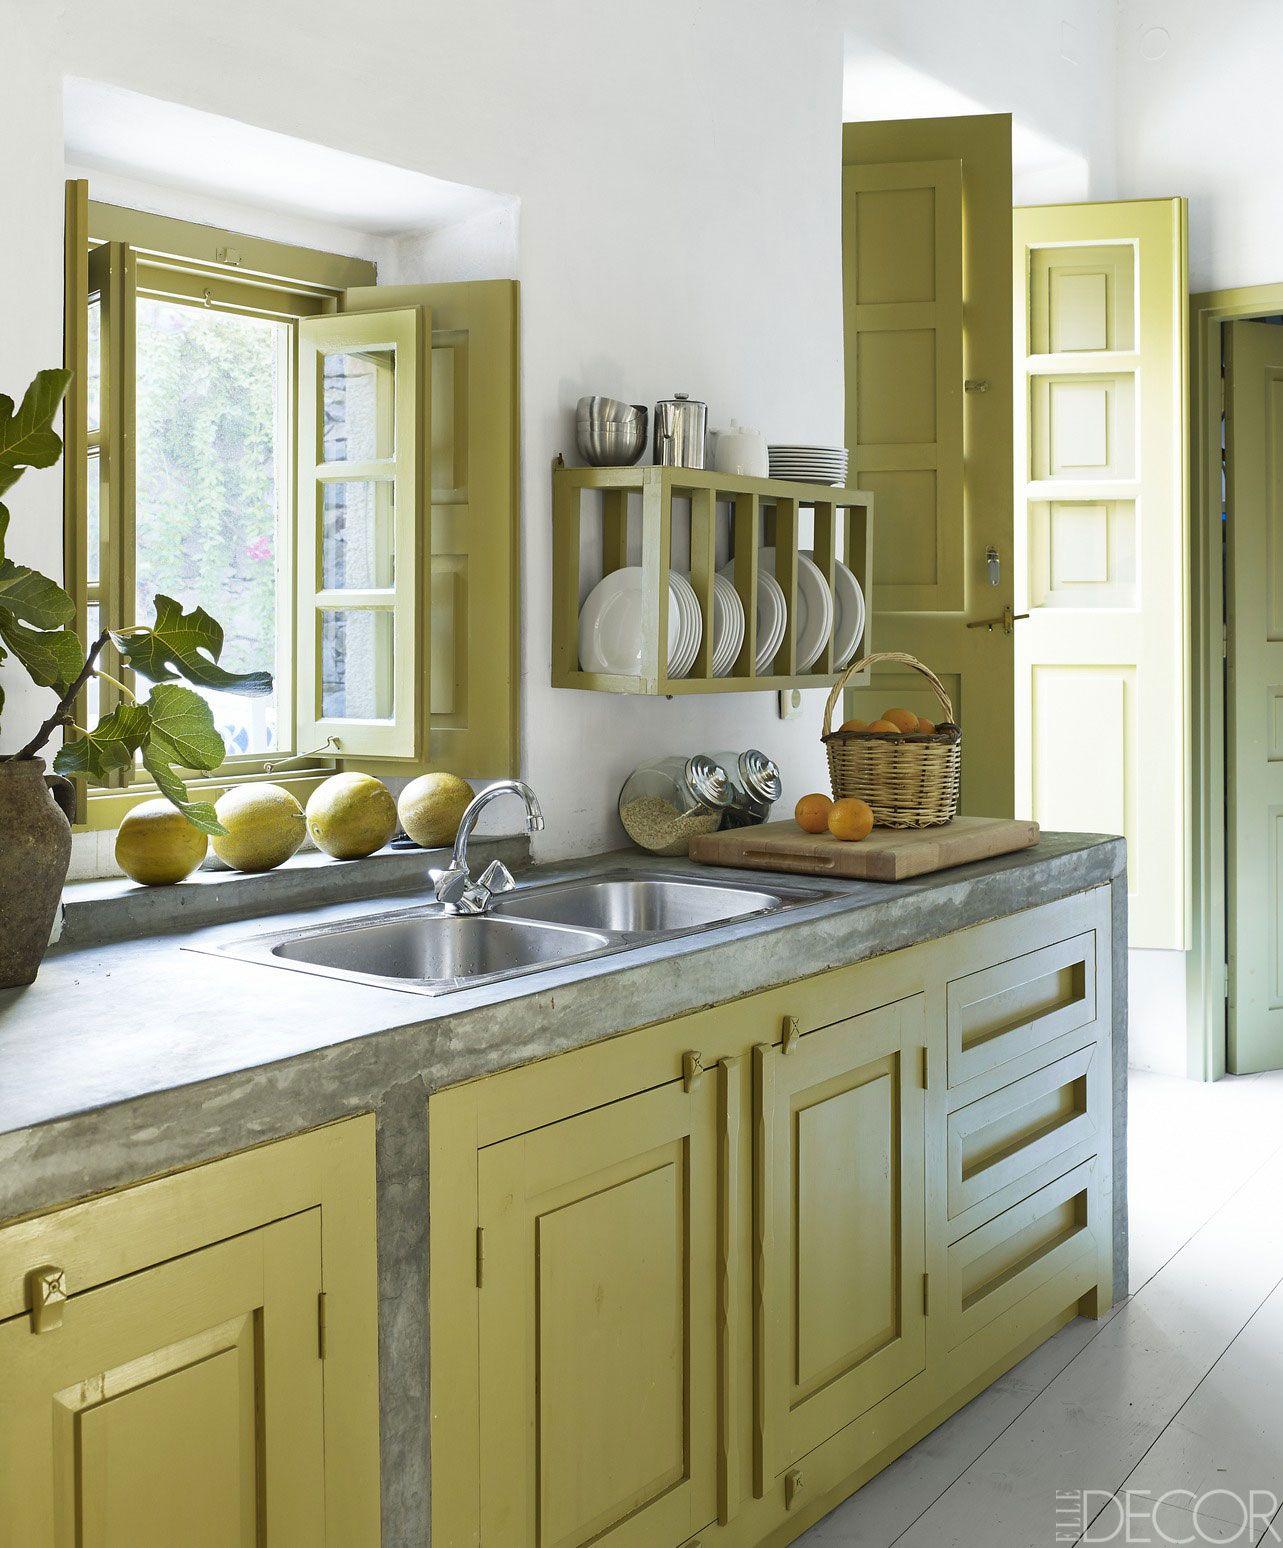 60 Brilliant Small Kitchen Ideas \u2013 Gorgeous Small Kitchen